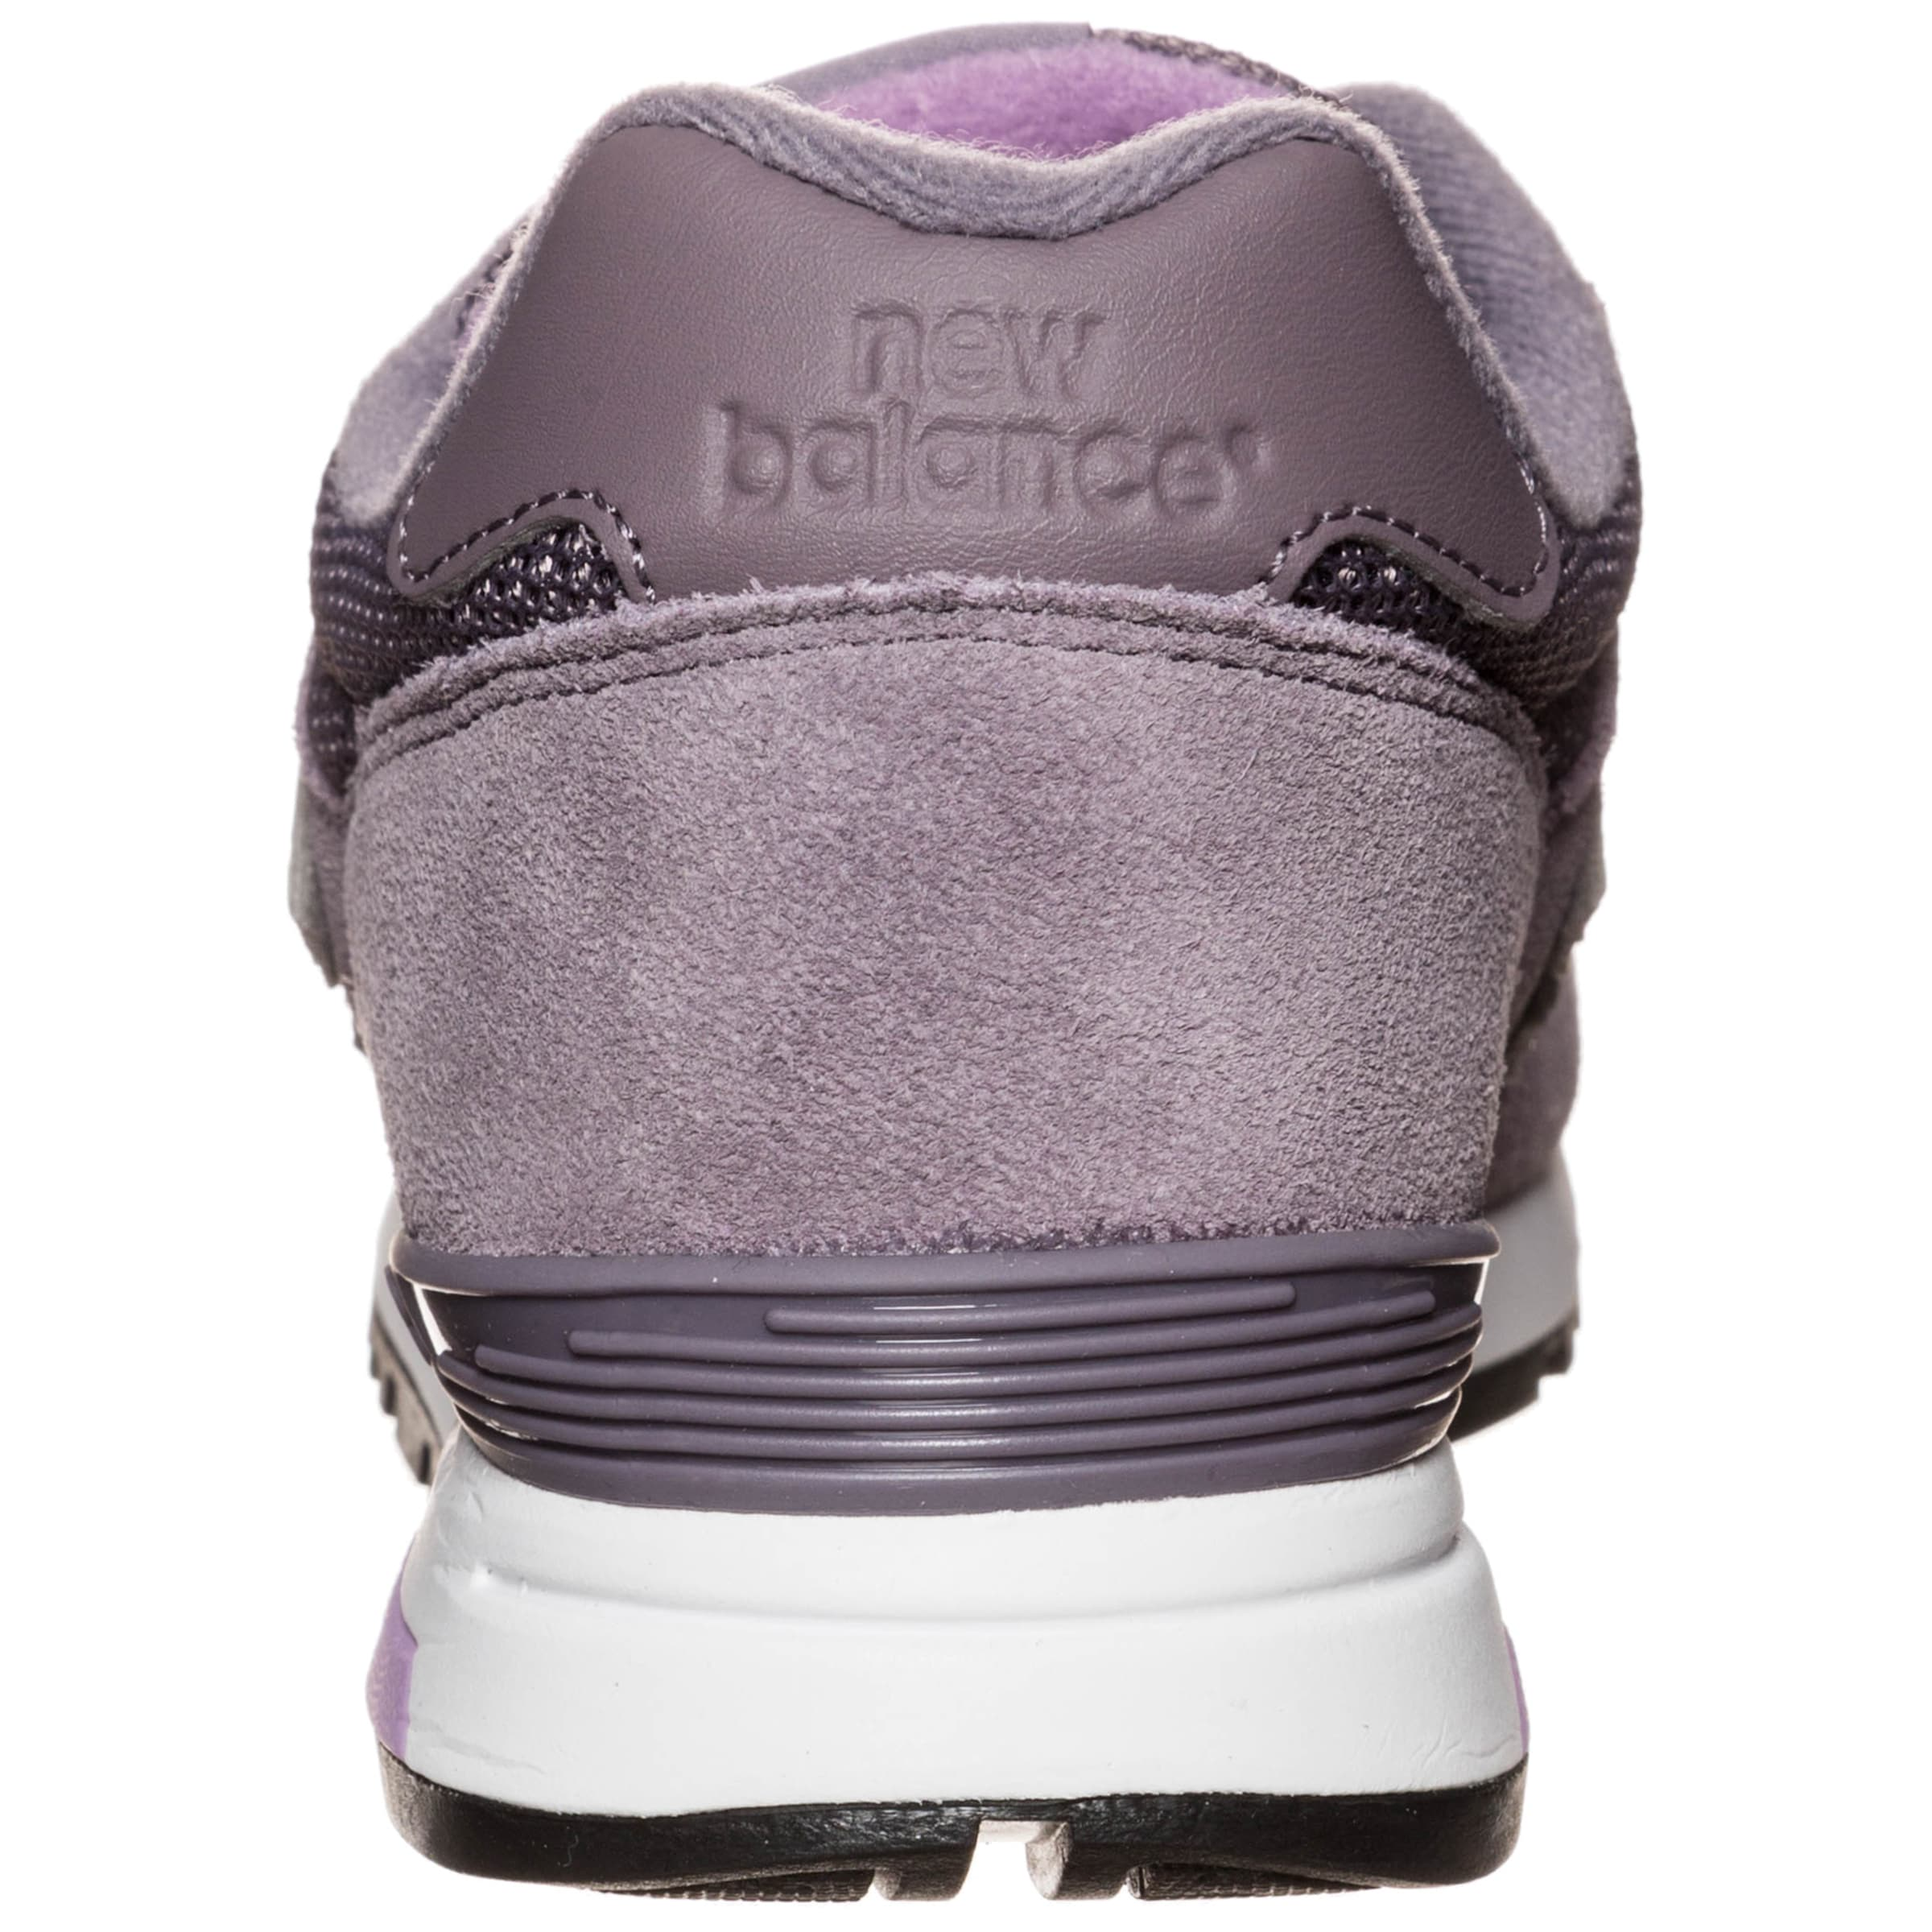 Basses Balance 'wl565 New Baskets VioletFoncé sll b' En LUzGqMjSVp